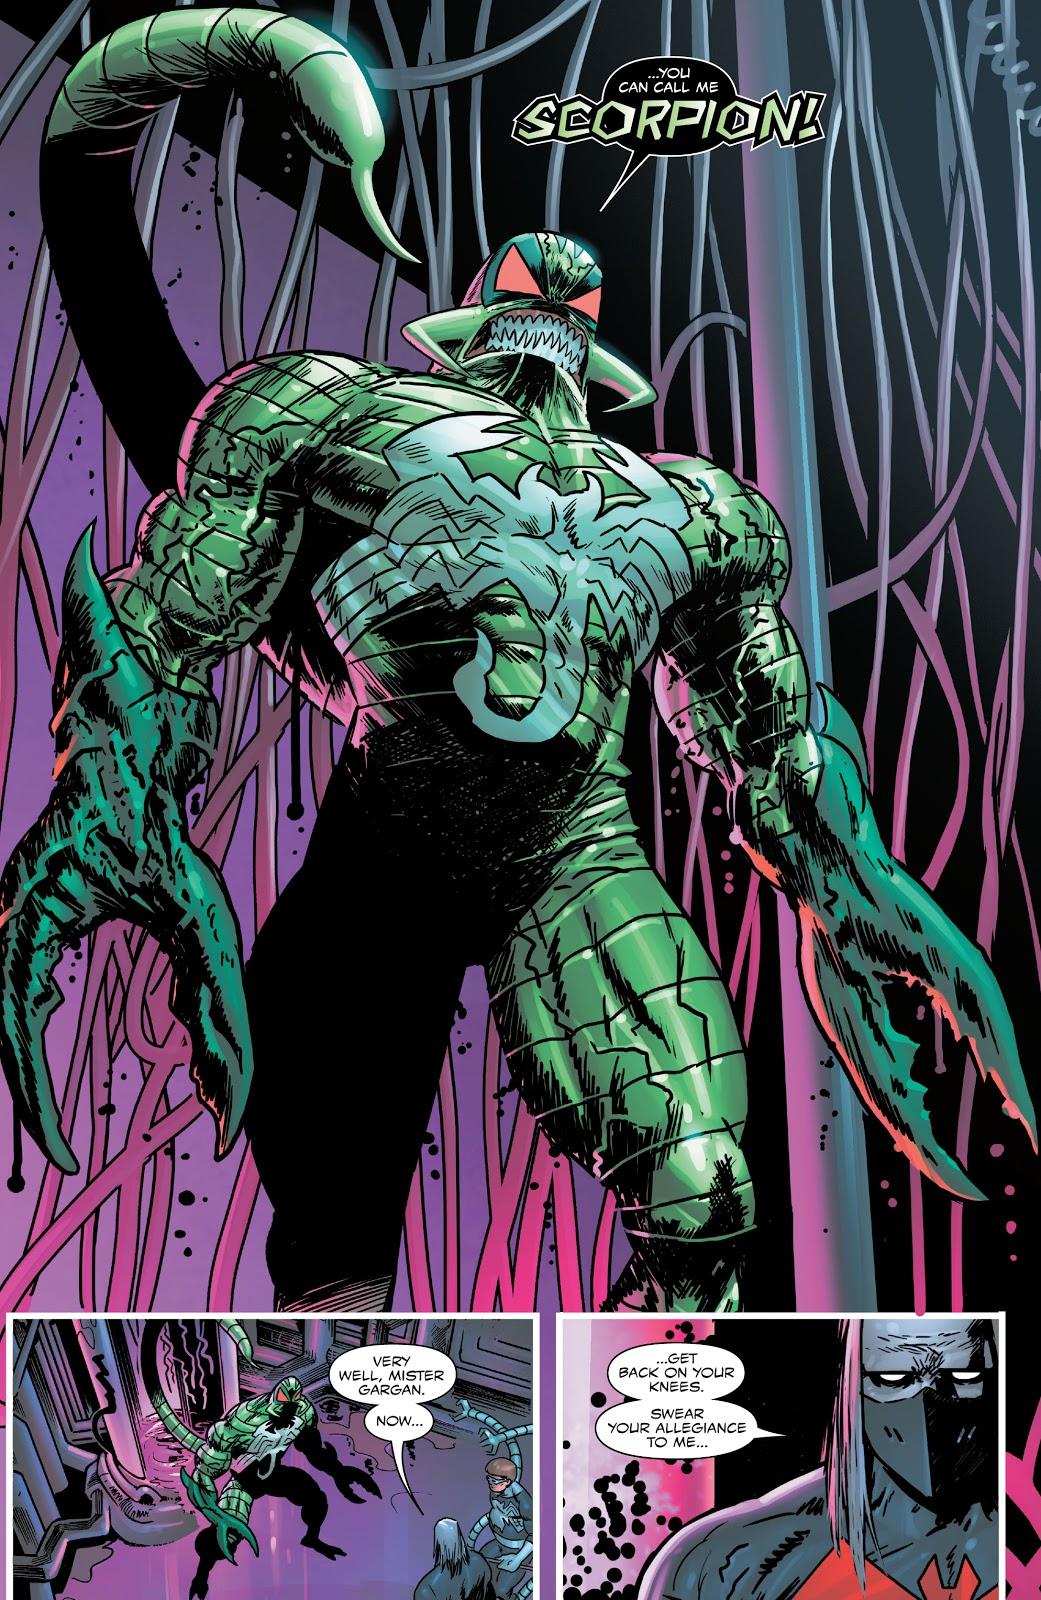 Scorpion Symbiote (Venom Vol. 4 #28) 1